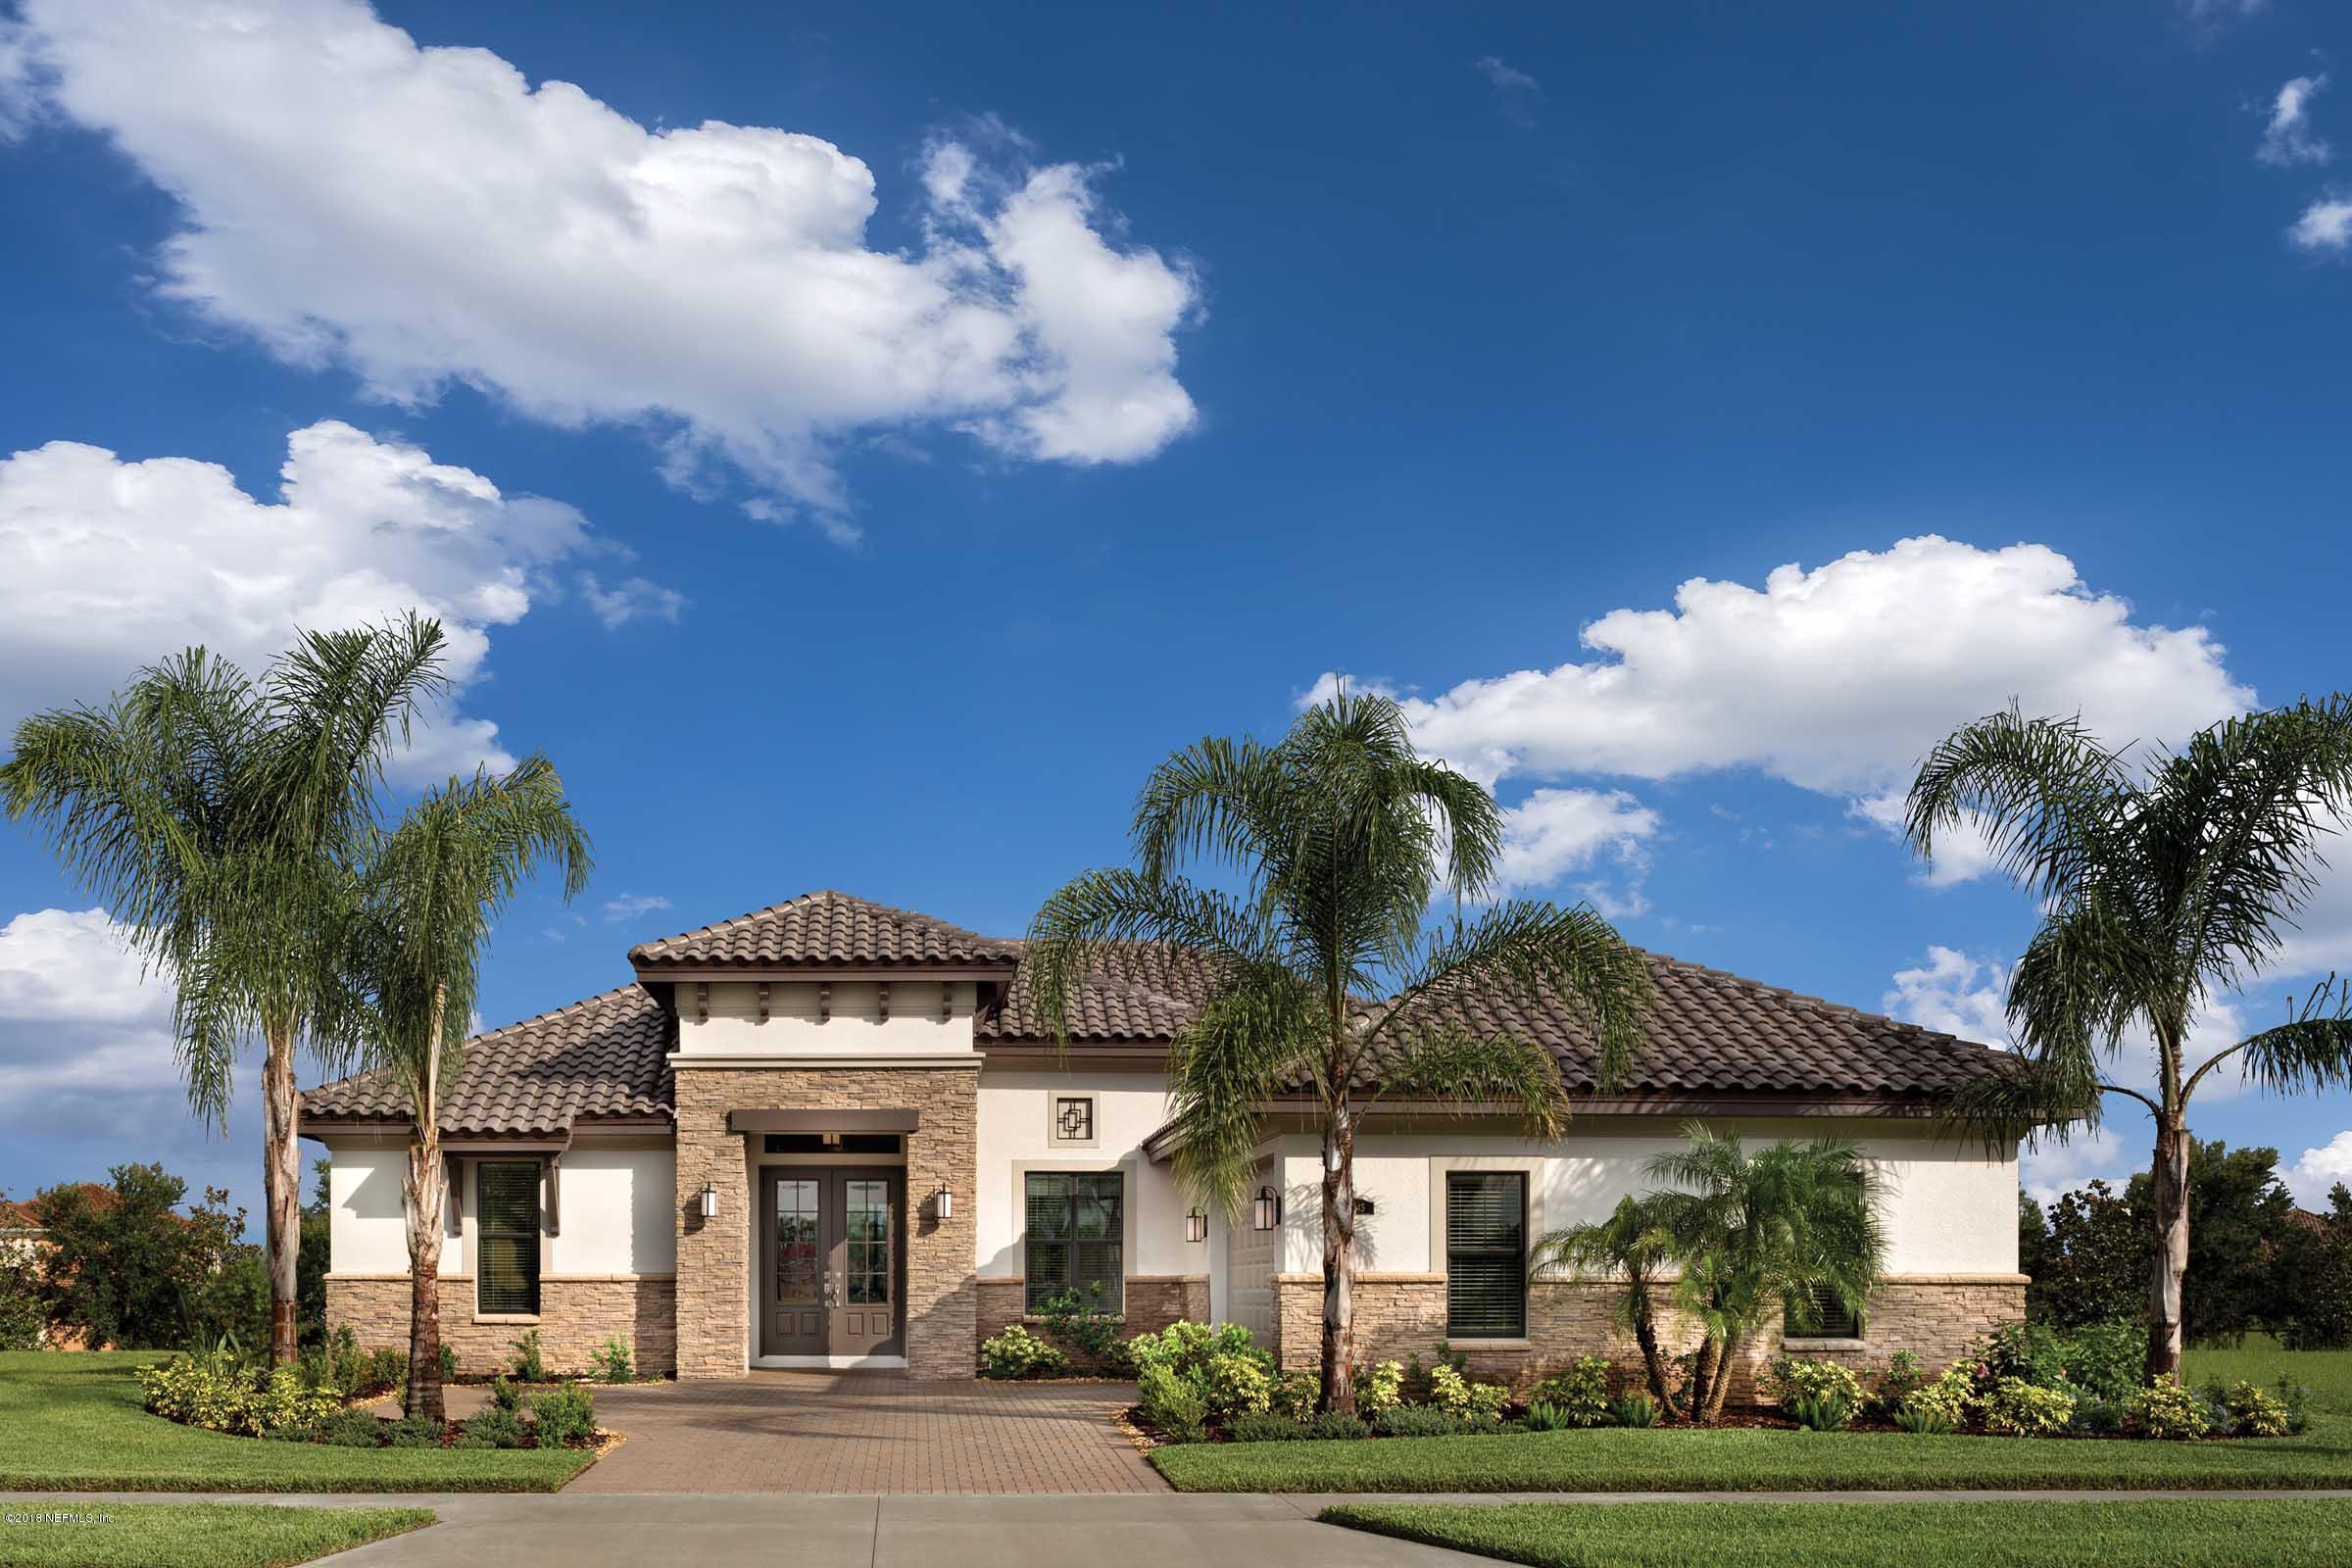 5028 SAN JOSE, JACKSONVILLE, FLORIDA 32207, 3 Bedrooms Bedrooms, ,3 BathroomsBathrooms,Residential - single family,For sale,SAN JOSE,960532